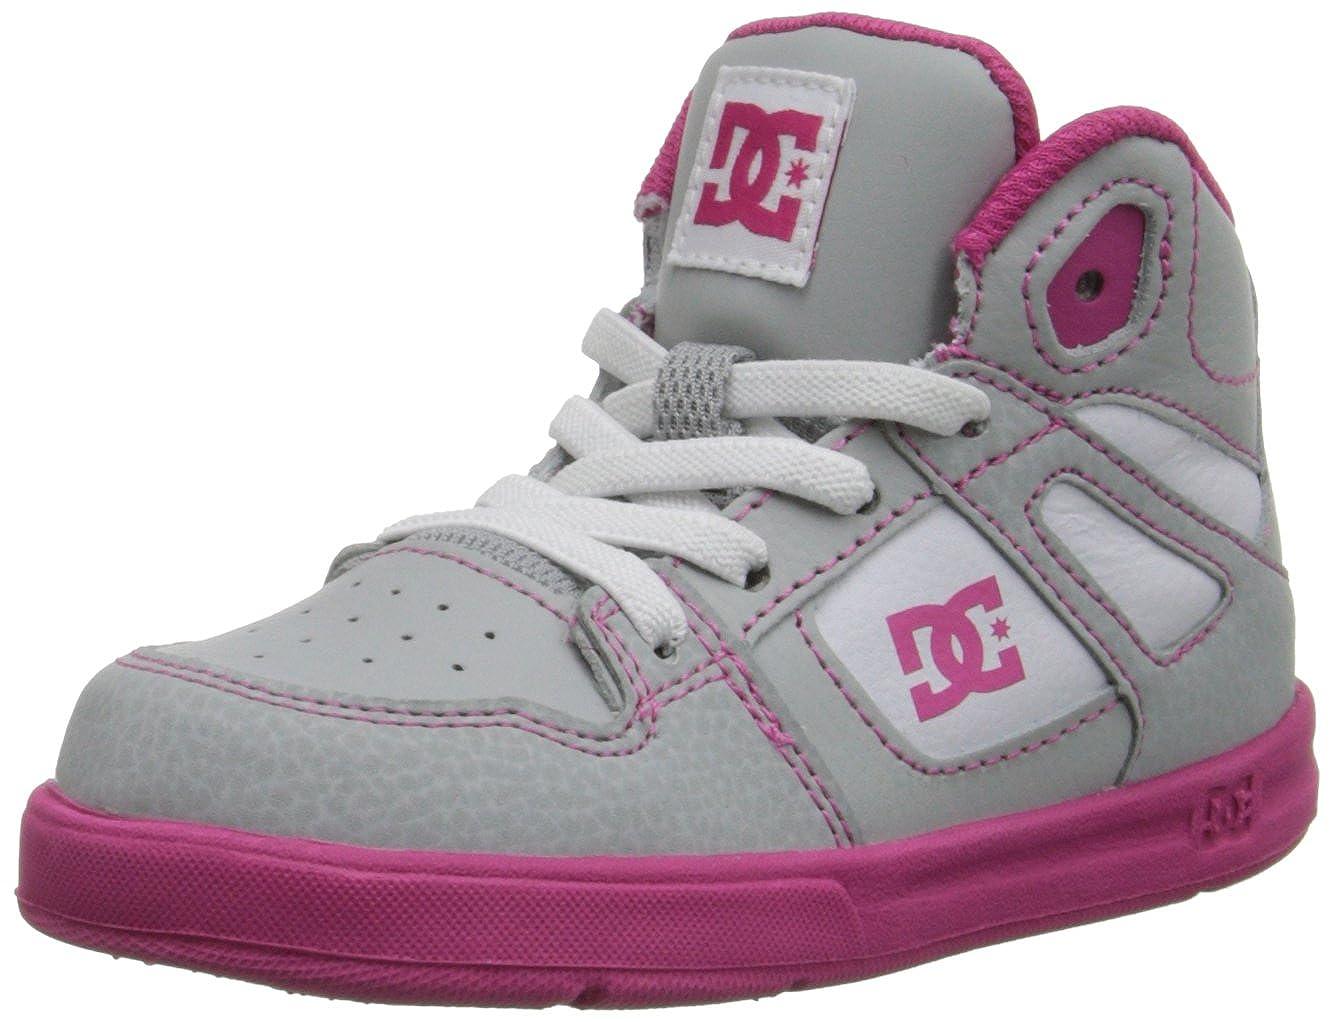 bacdb0808acc7 DC Shoes Kids' Dc Youth Rebound Skate Shoes